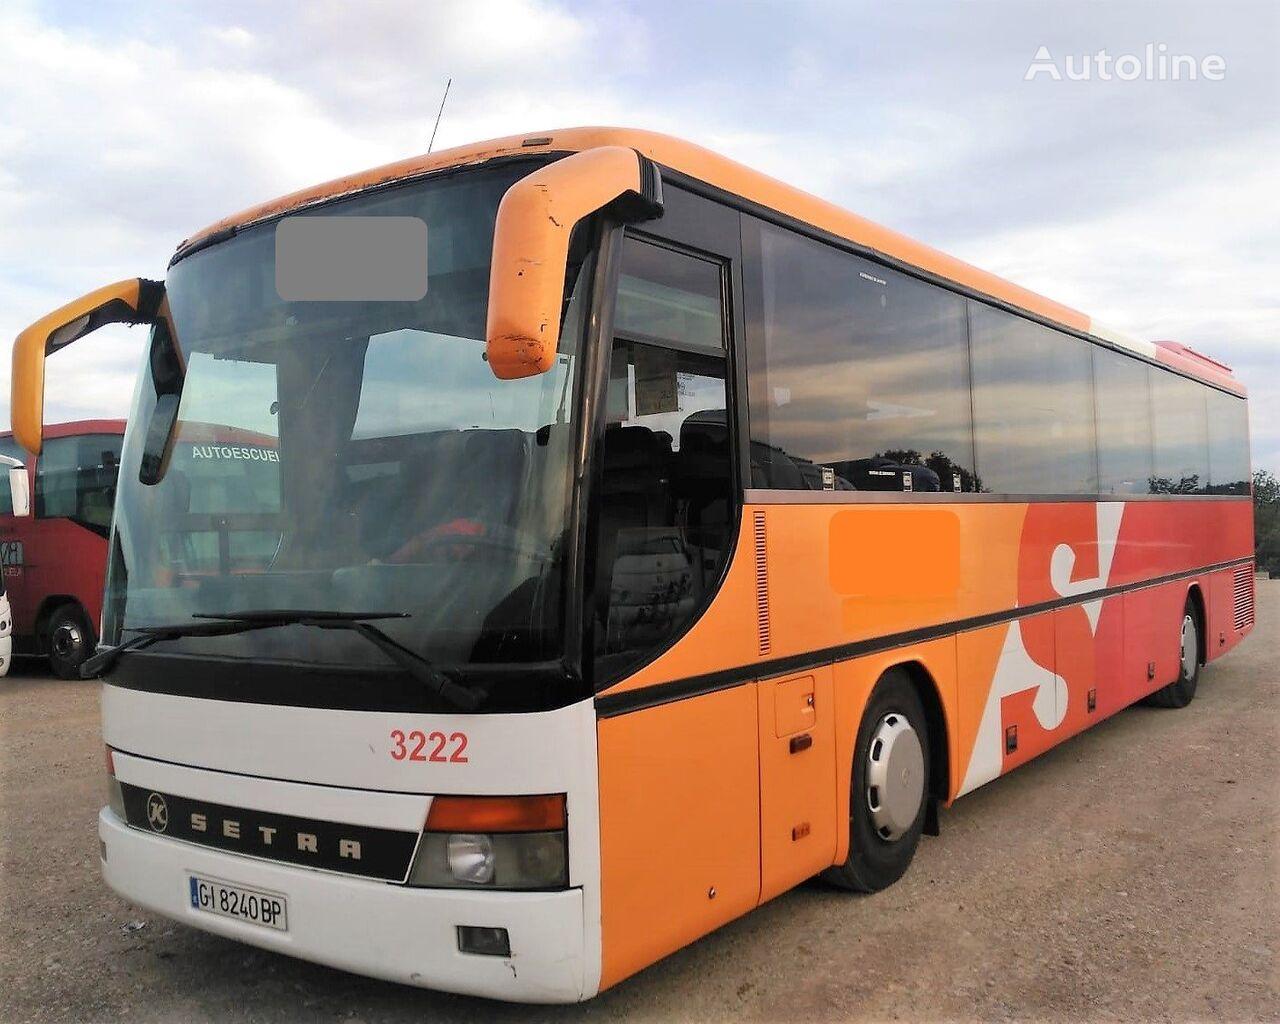 turistinis autobusas SETRA S315 GT  8 CILINDROS MOTOR MERCEDES+8CILI+380CV